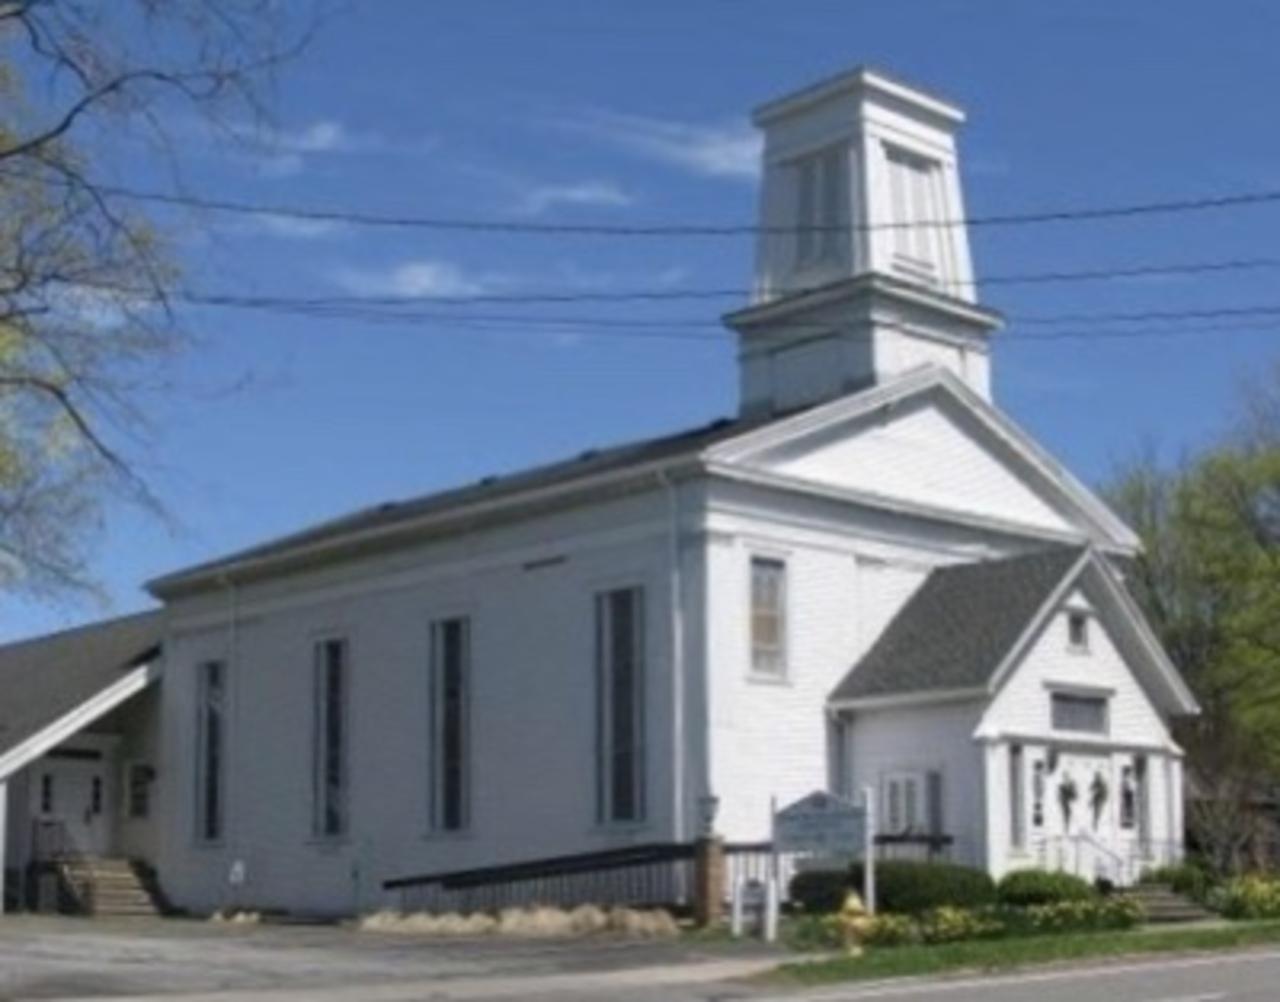 FIRST BAPTIST CHURCH OF PENFIELD